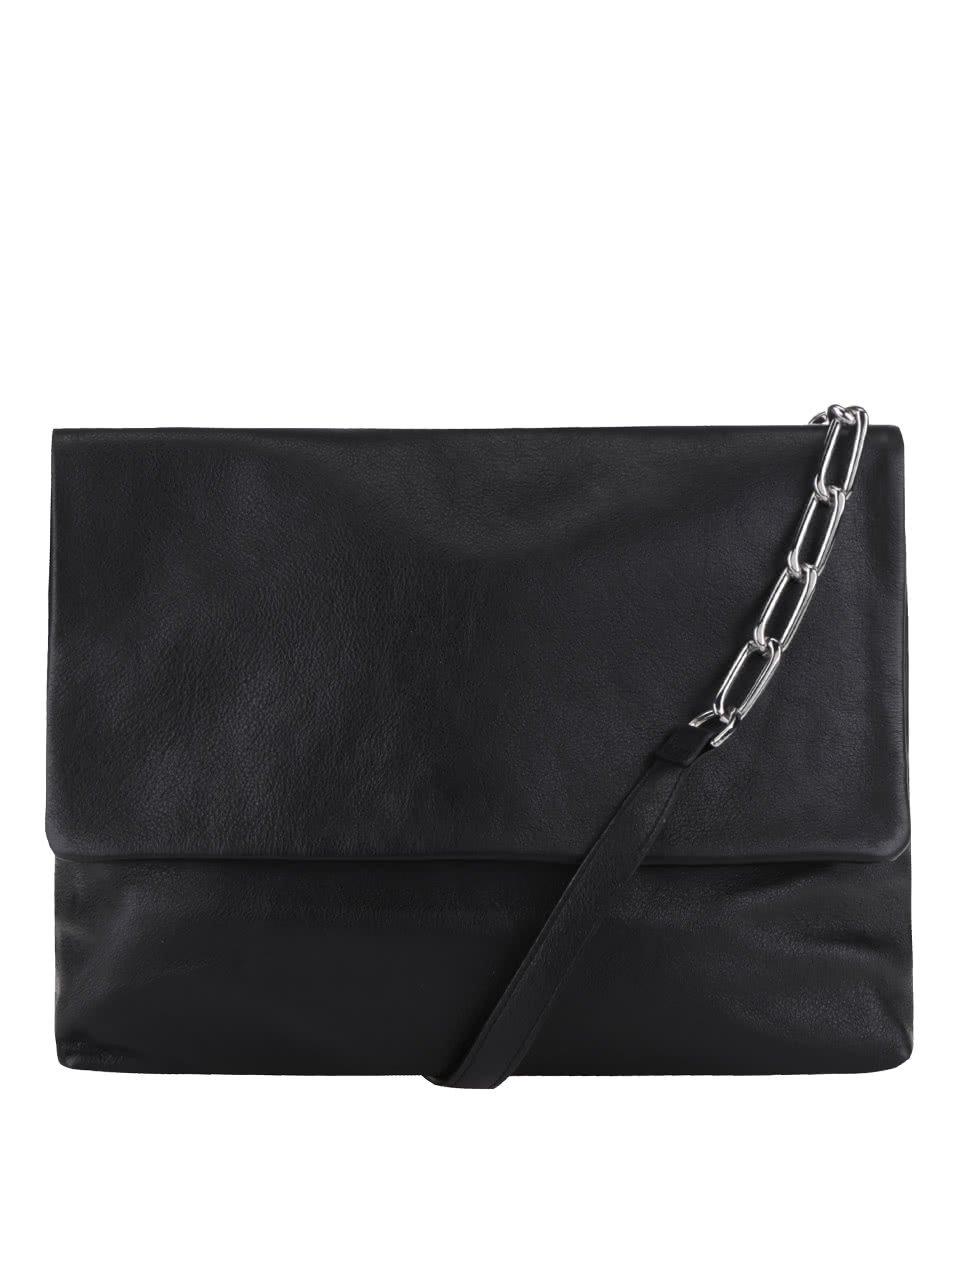 Černá kožená crossbody kabelka s ozdobným popruhem No. 83 Vagabond